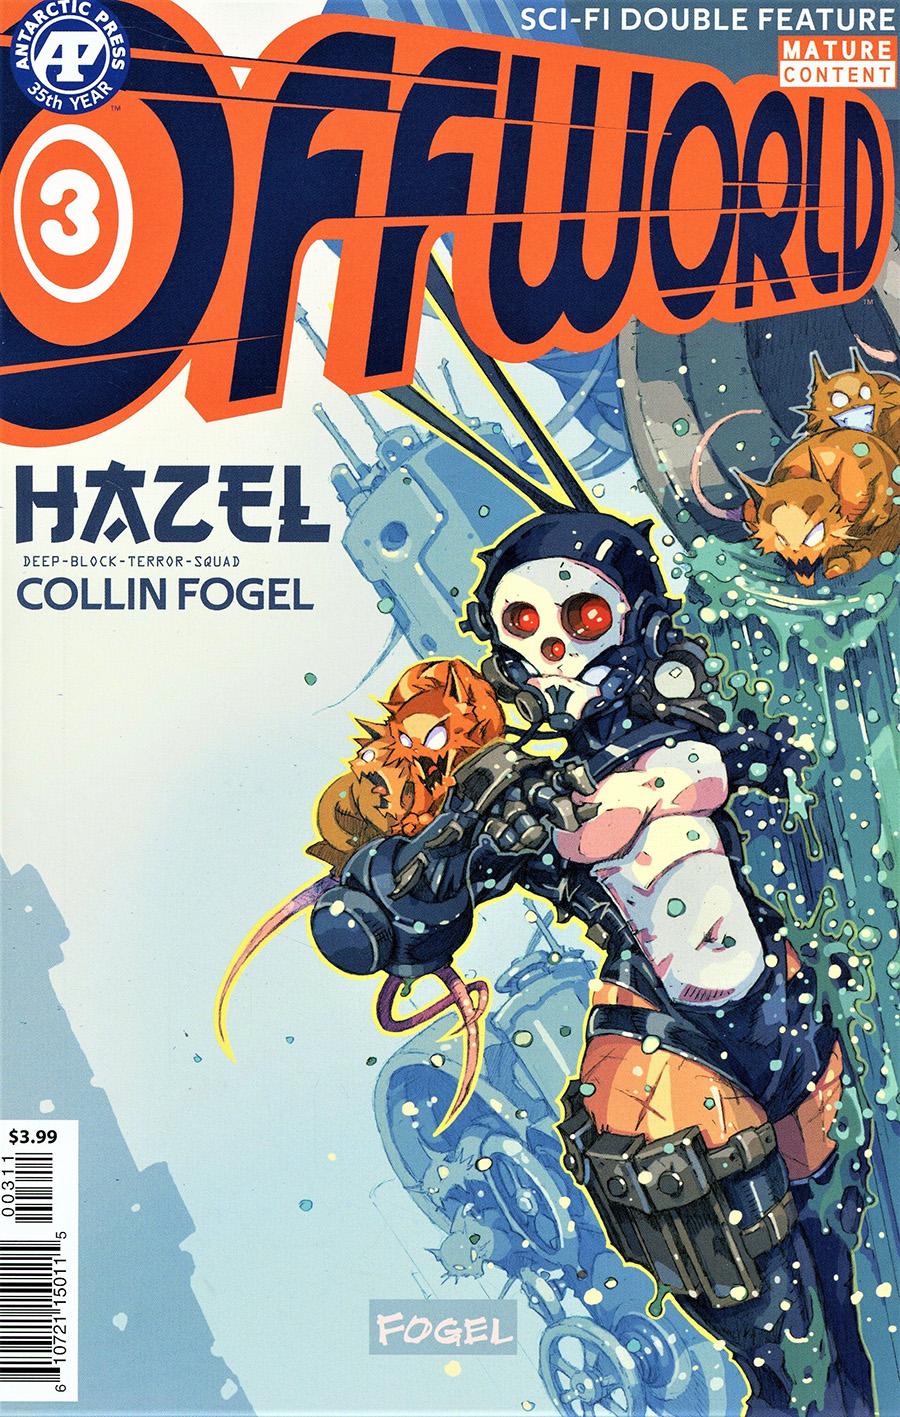 Offworld Sci-Fi Double Feature #3